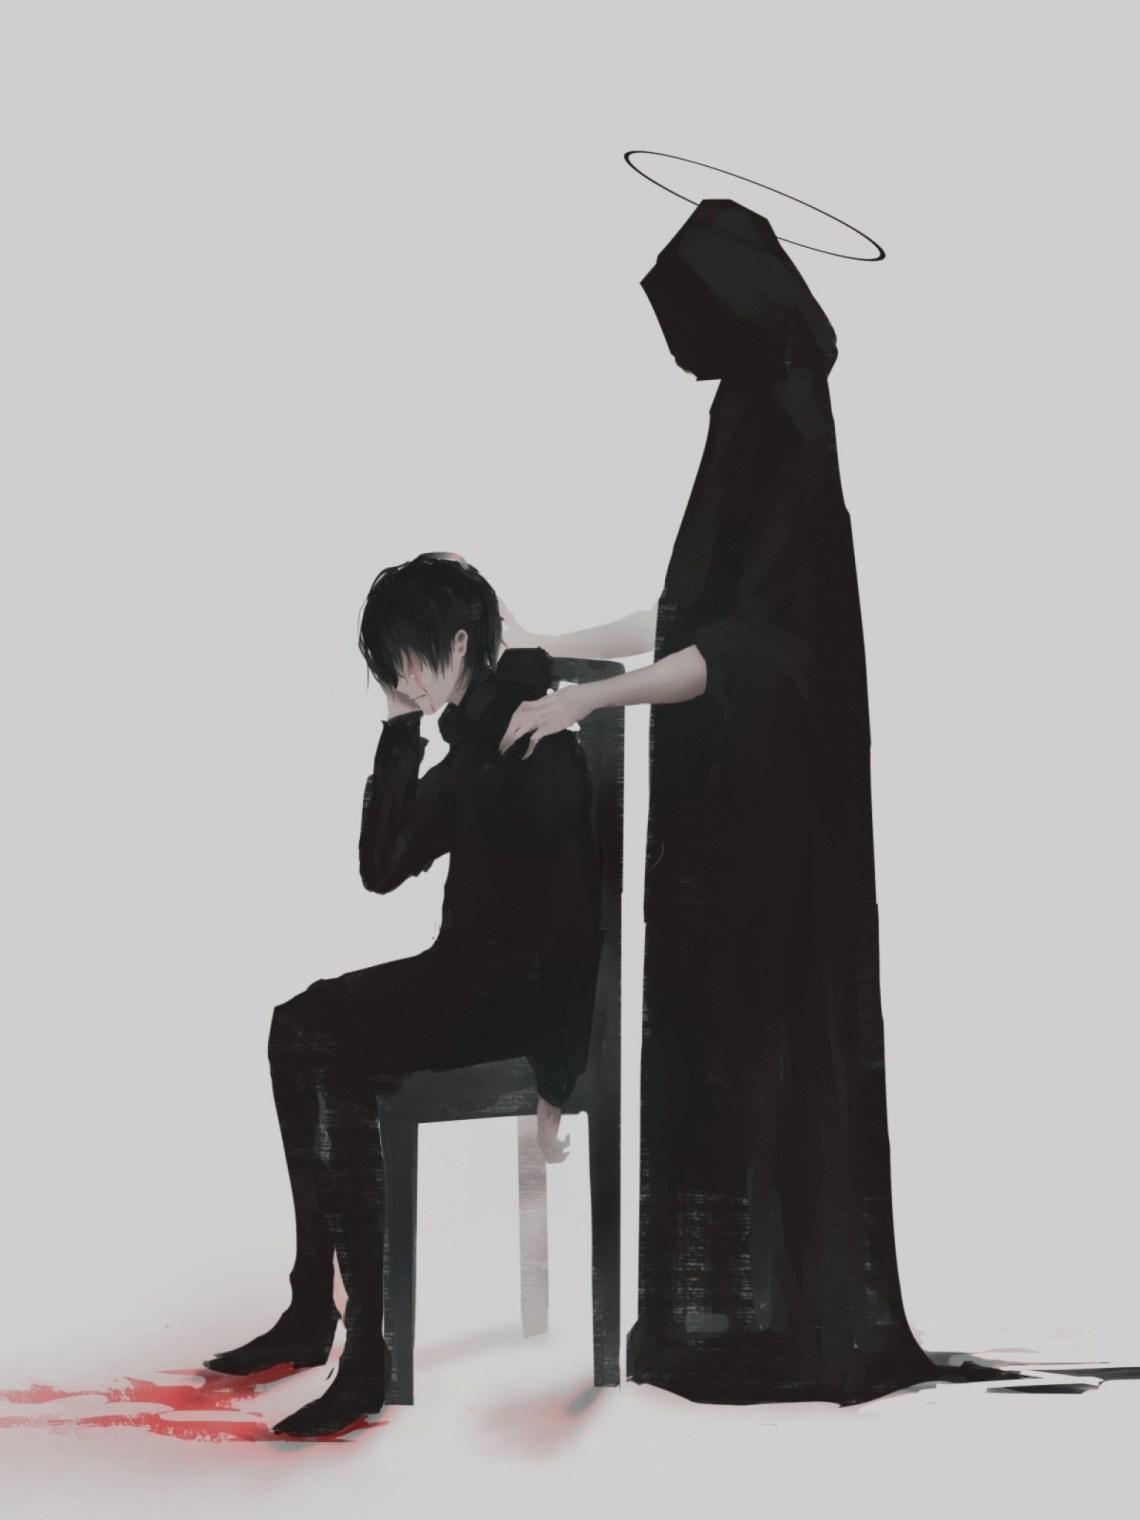 Anime Boy The Reaper Sad 1536x2048 Download Hd Wallpaper Wallpapertip